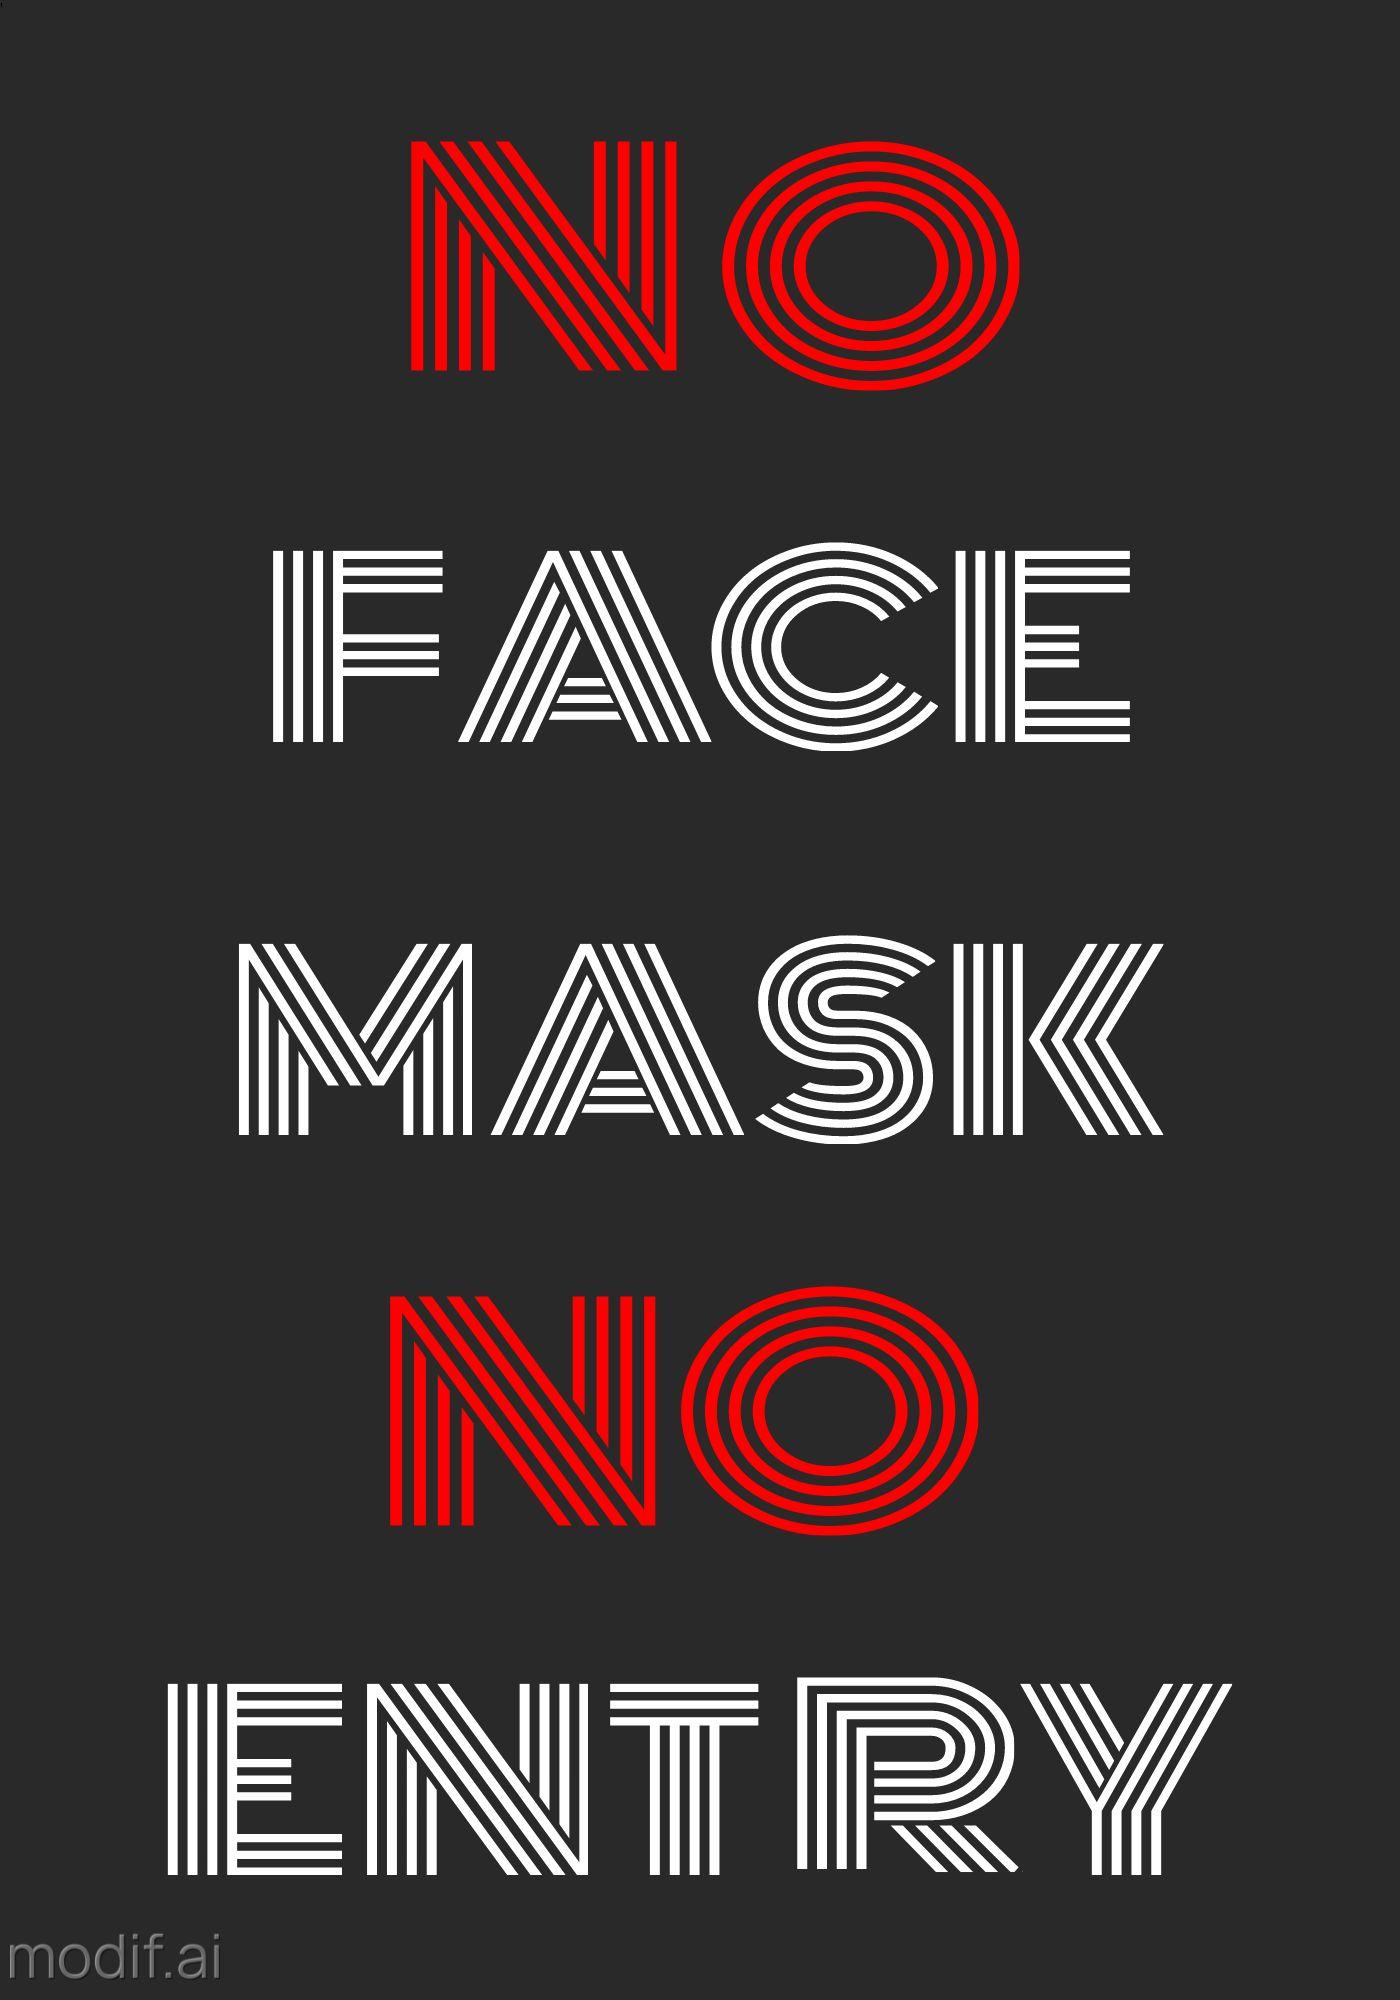 Poster No Mask No Entry